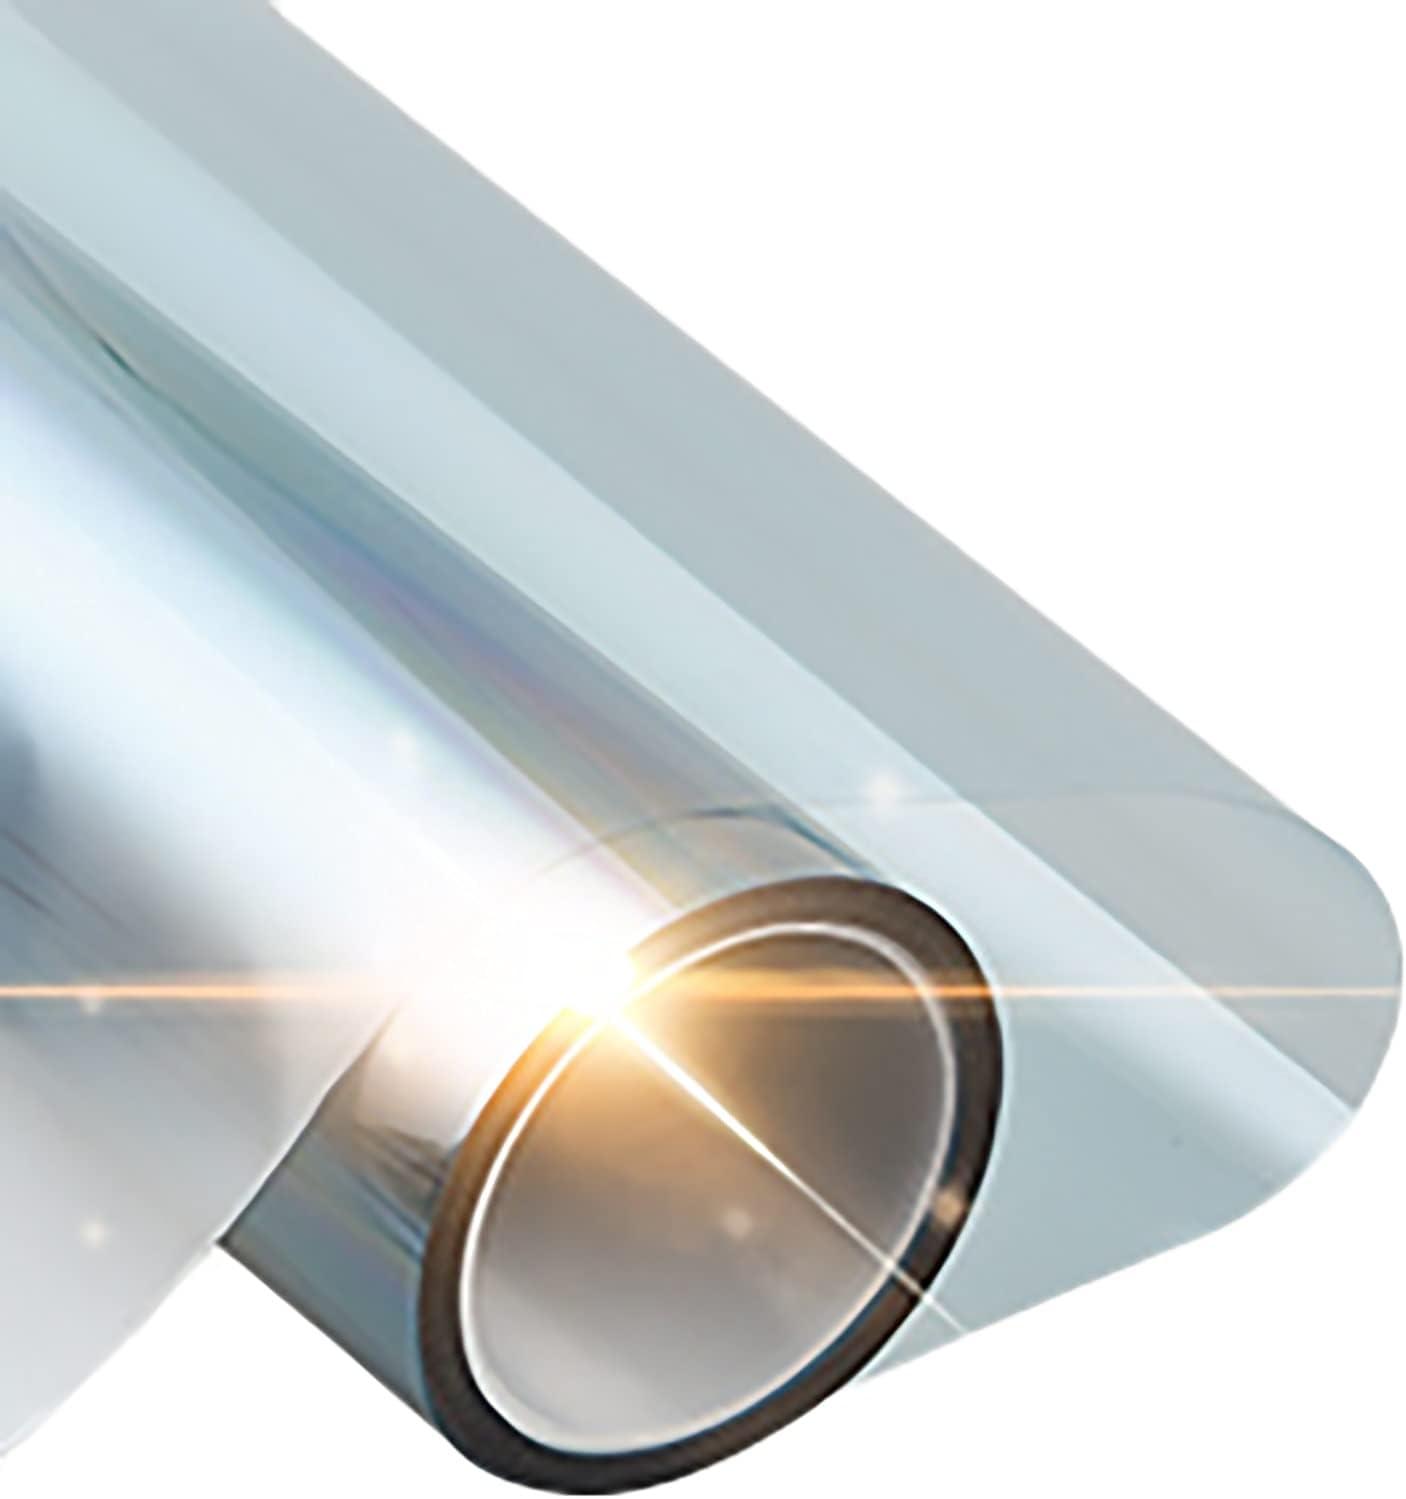 BCGT Window Film Heat Control Residential [Alternative dealer] specialty shop Fi Cling Static